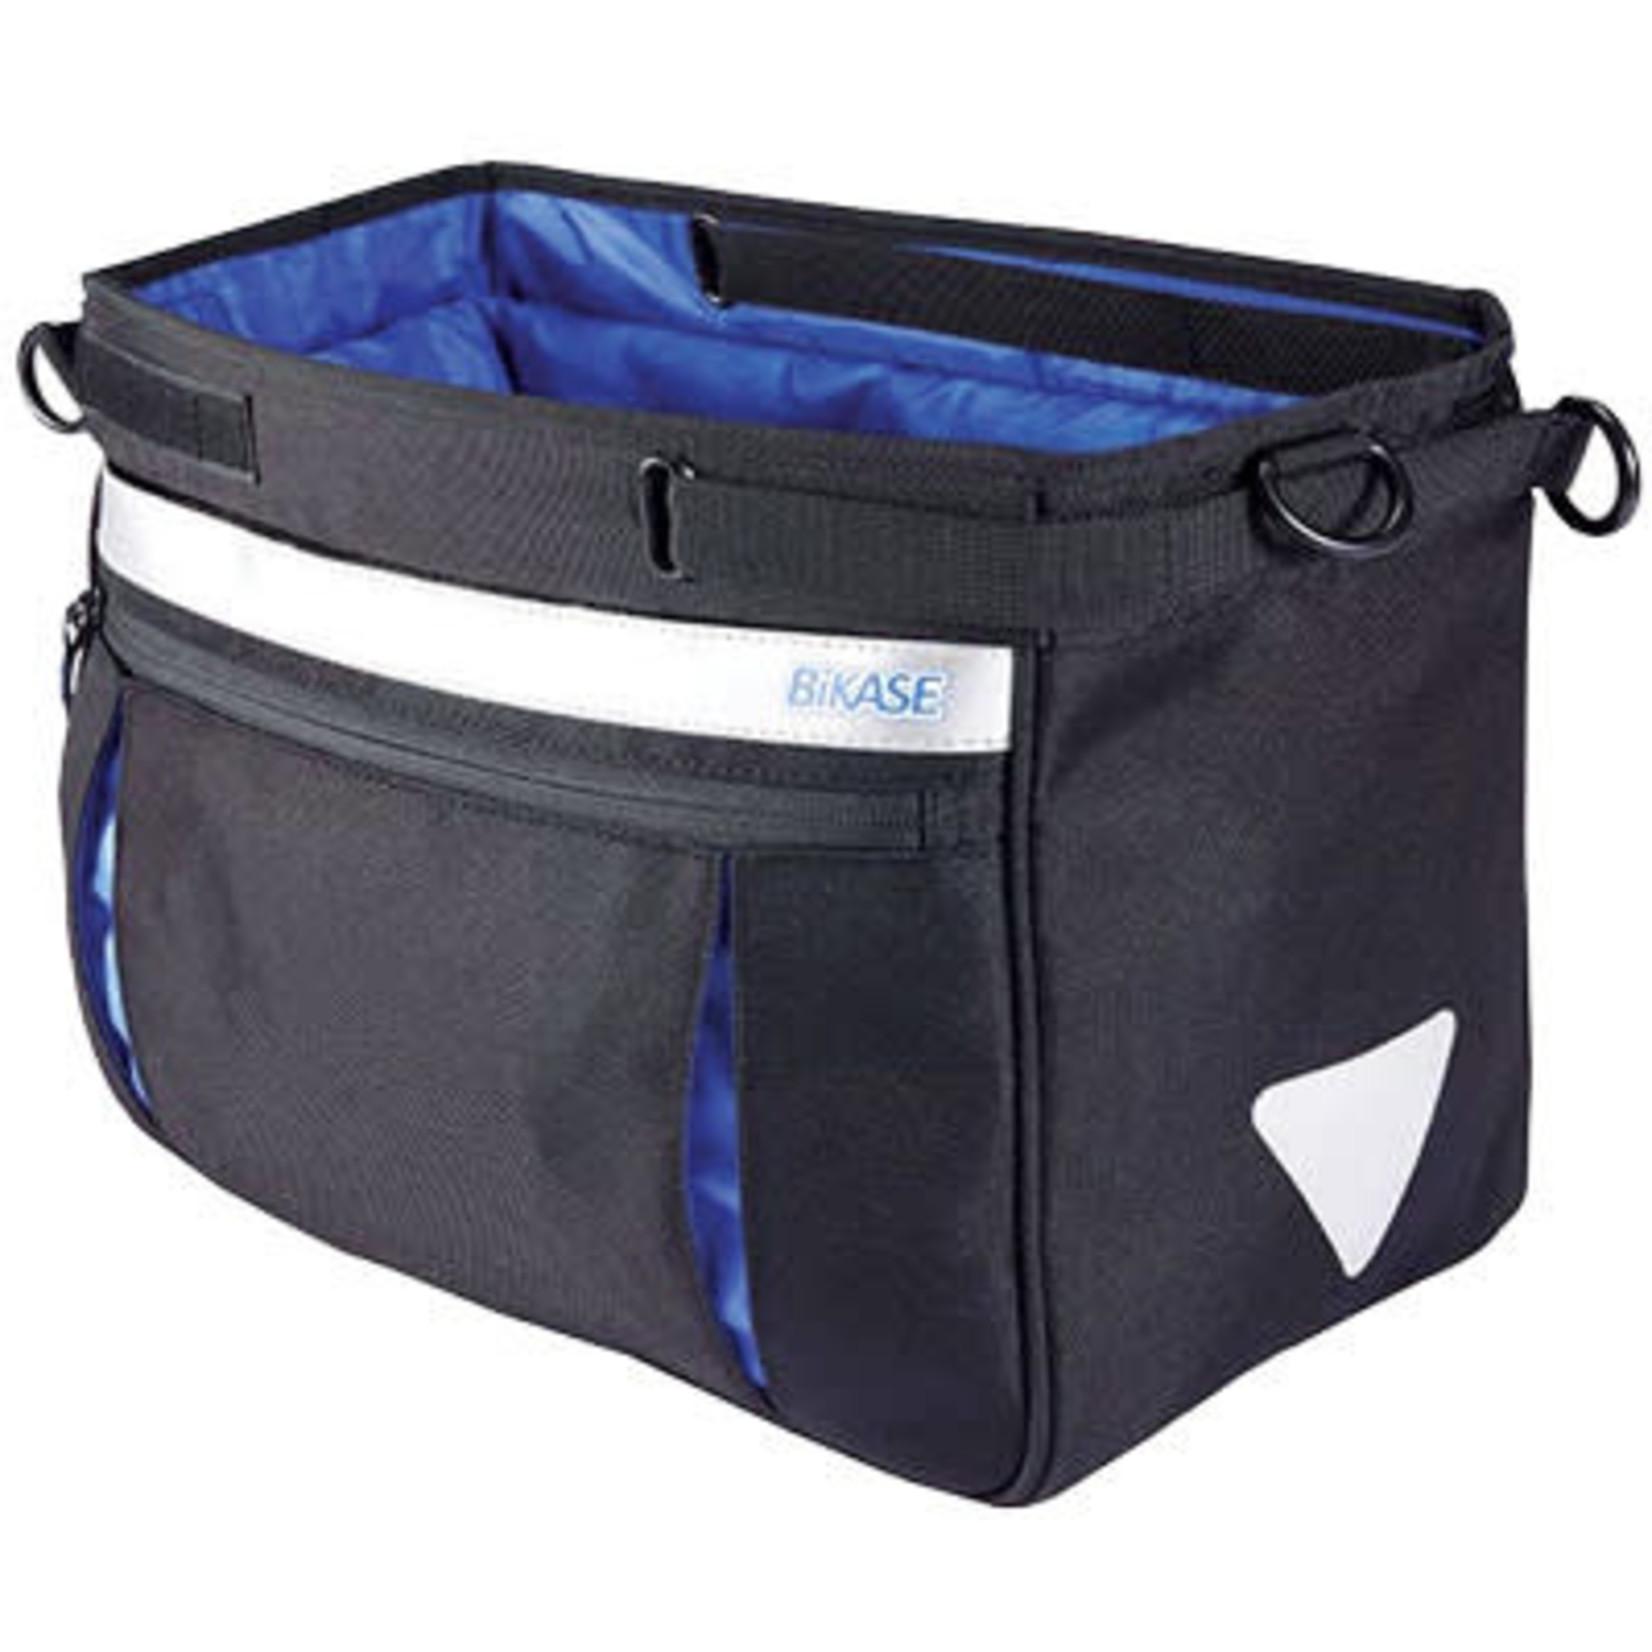 BiKASE Bikase Grocery Bag Pannier